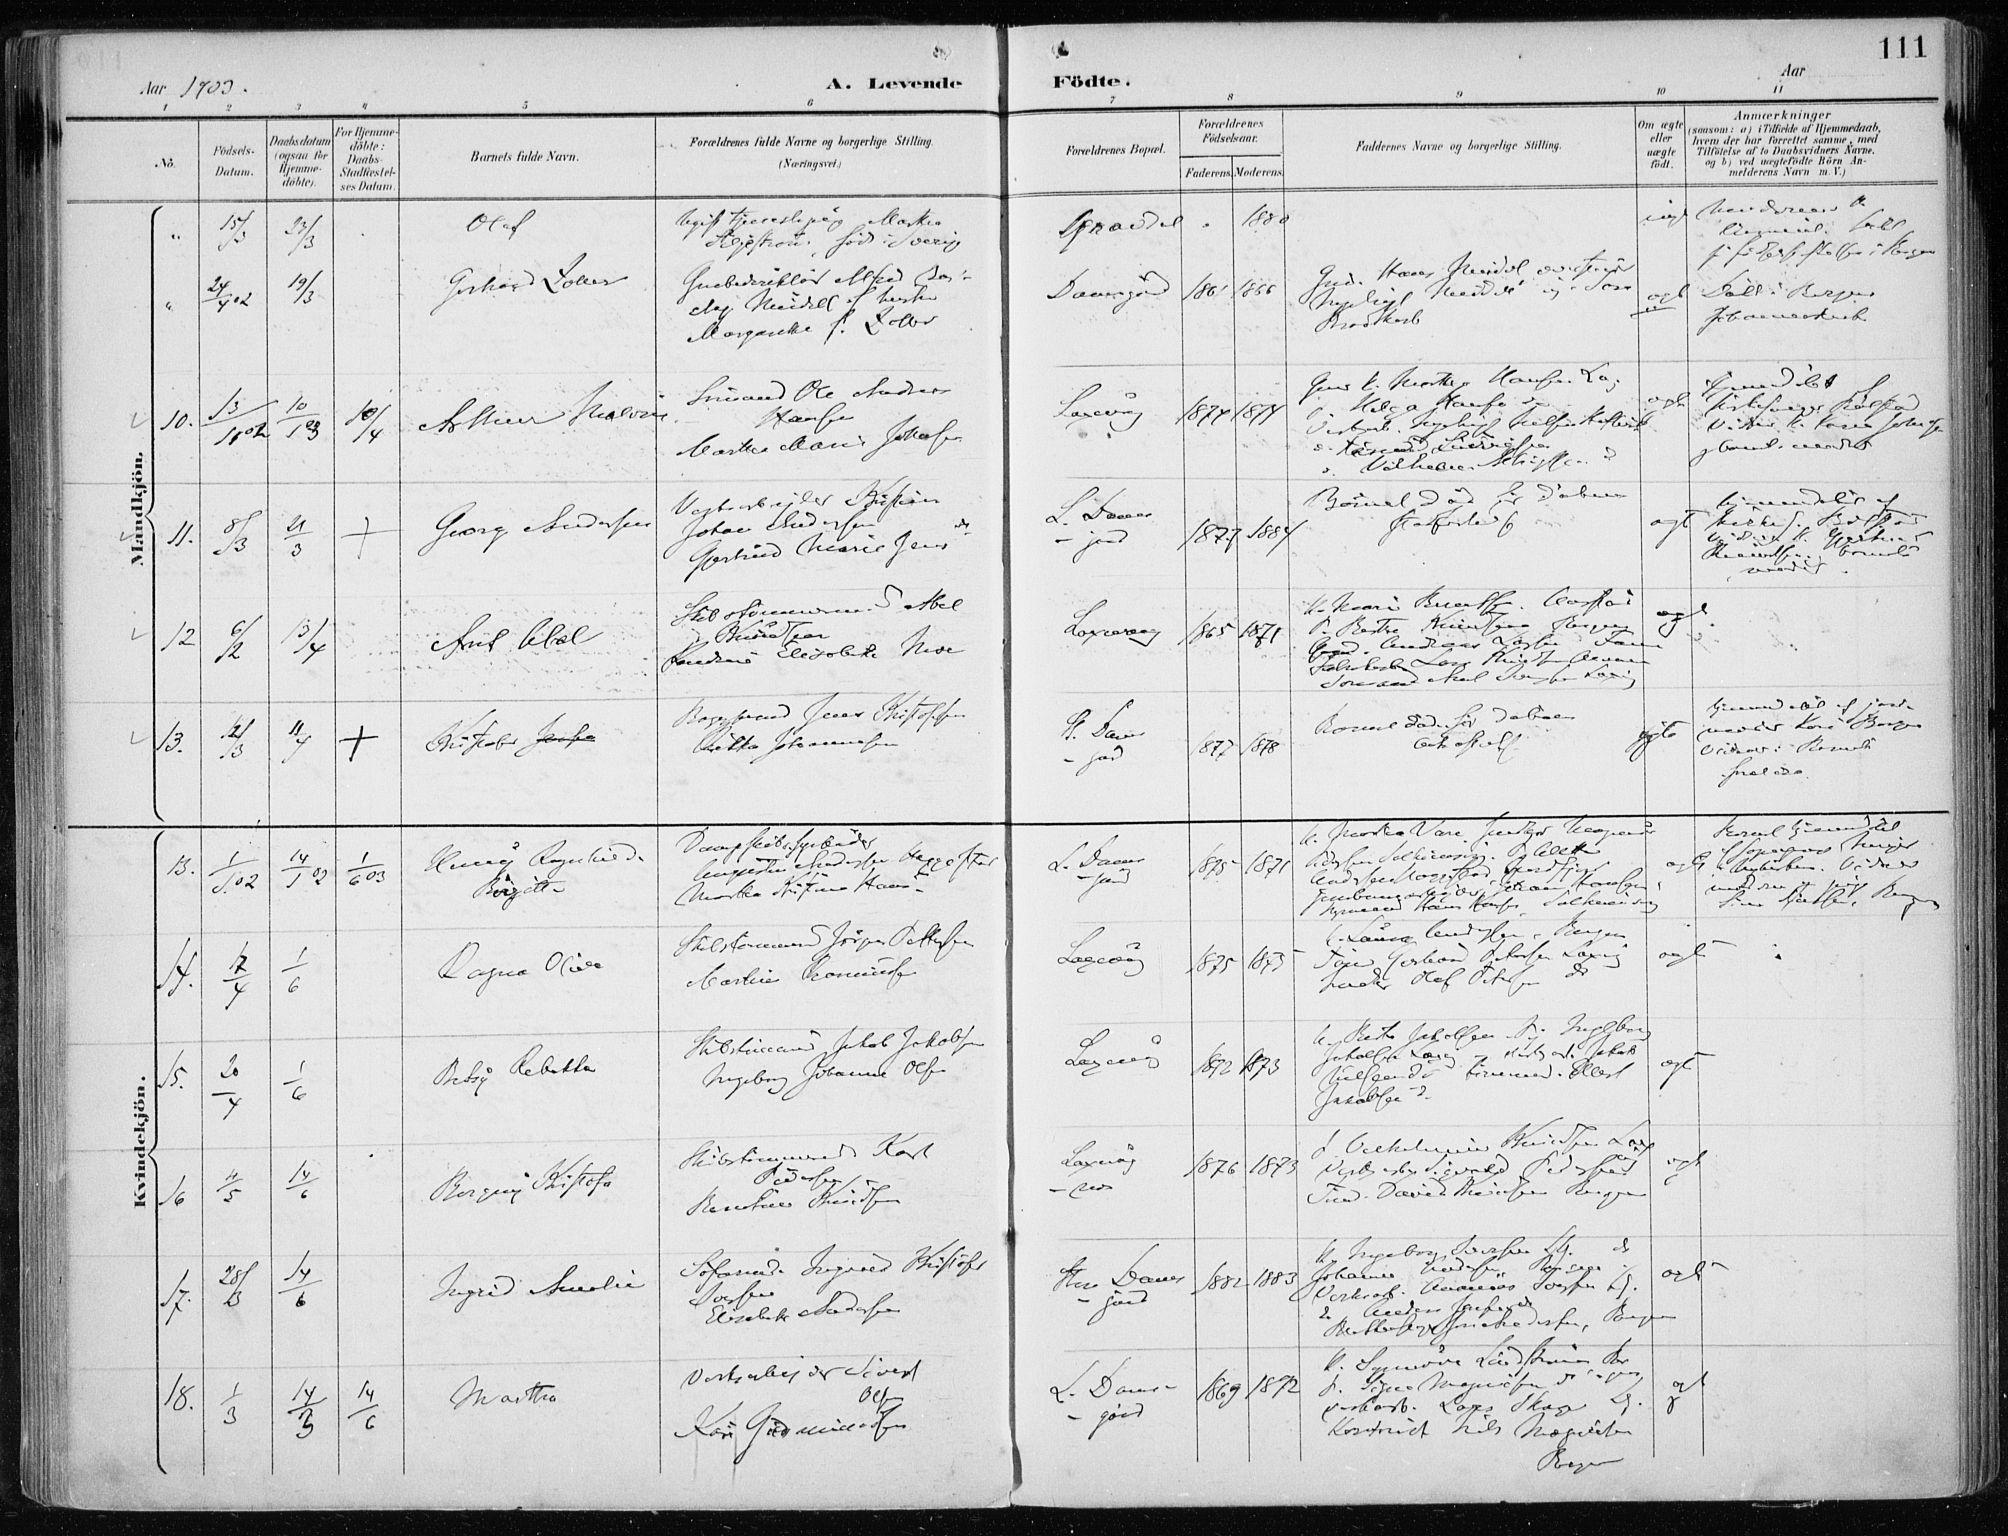 SAB, Laksevåg Sokneprestembete, H/Haa: Ministerialbok nr. A 3, 1891-1903, s. 111